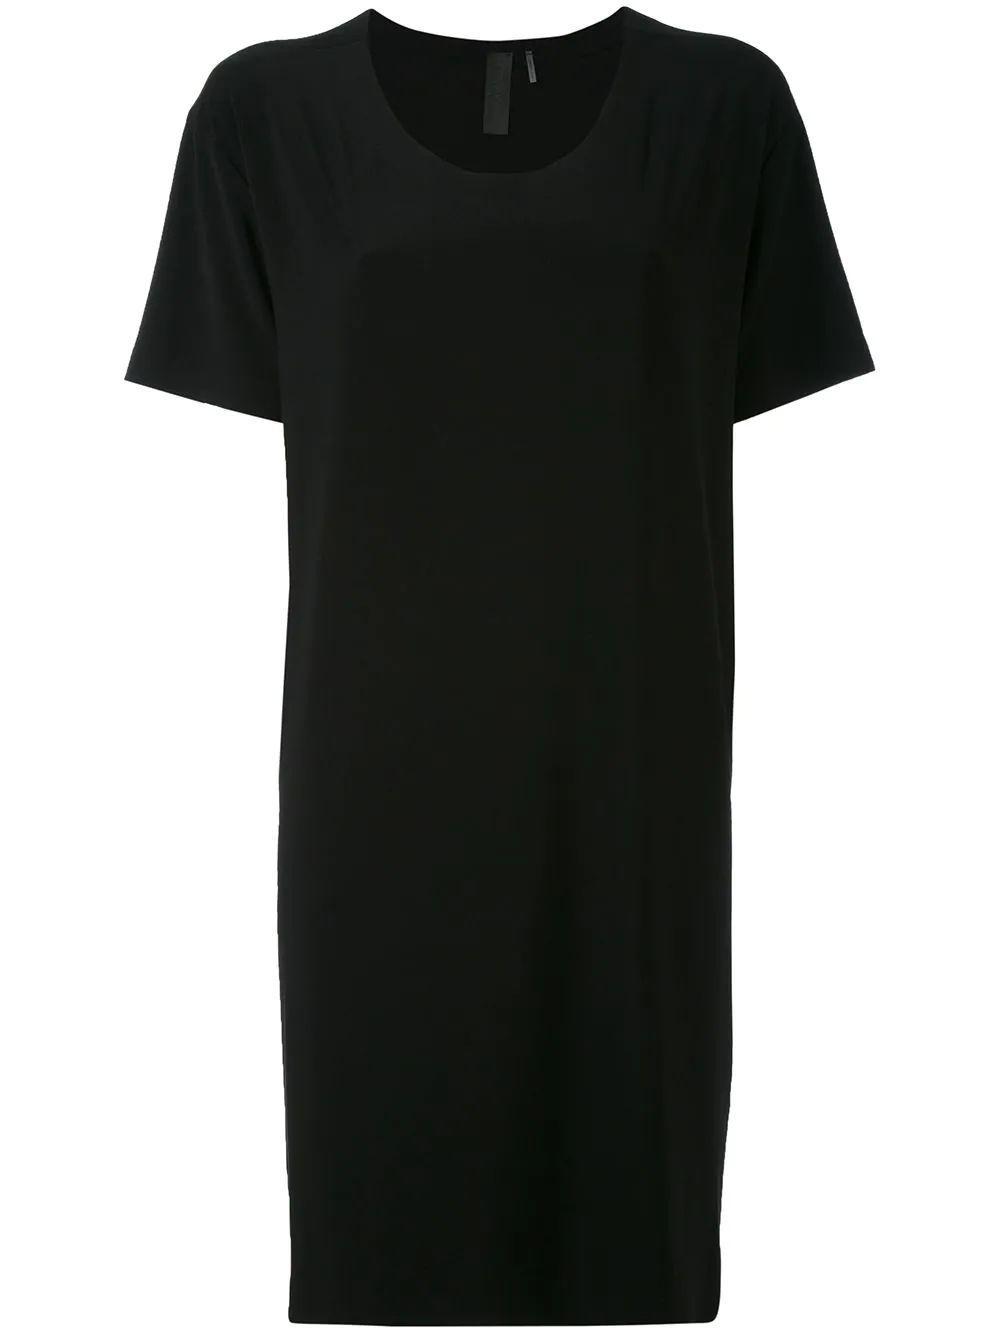 Short Sleeve Oversized Dress Item # KK4263PL105001